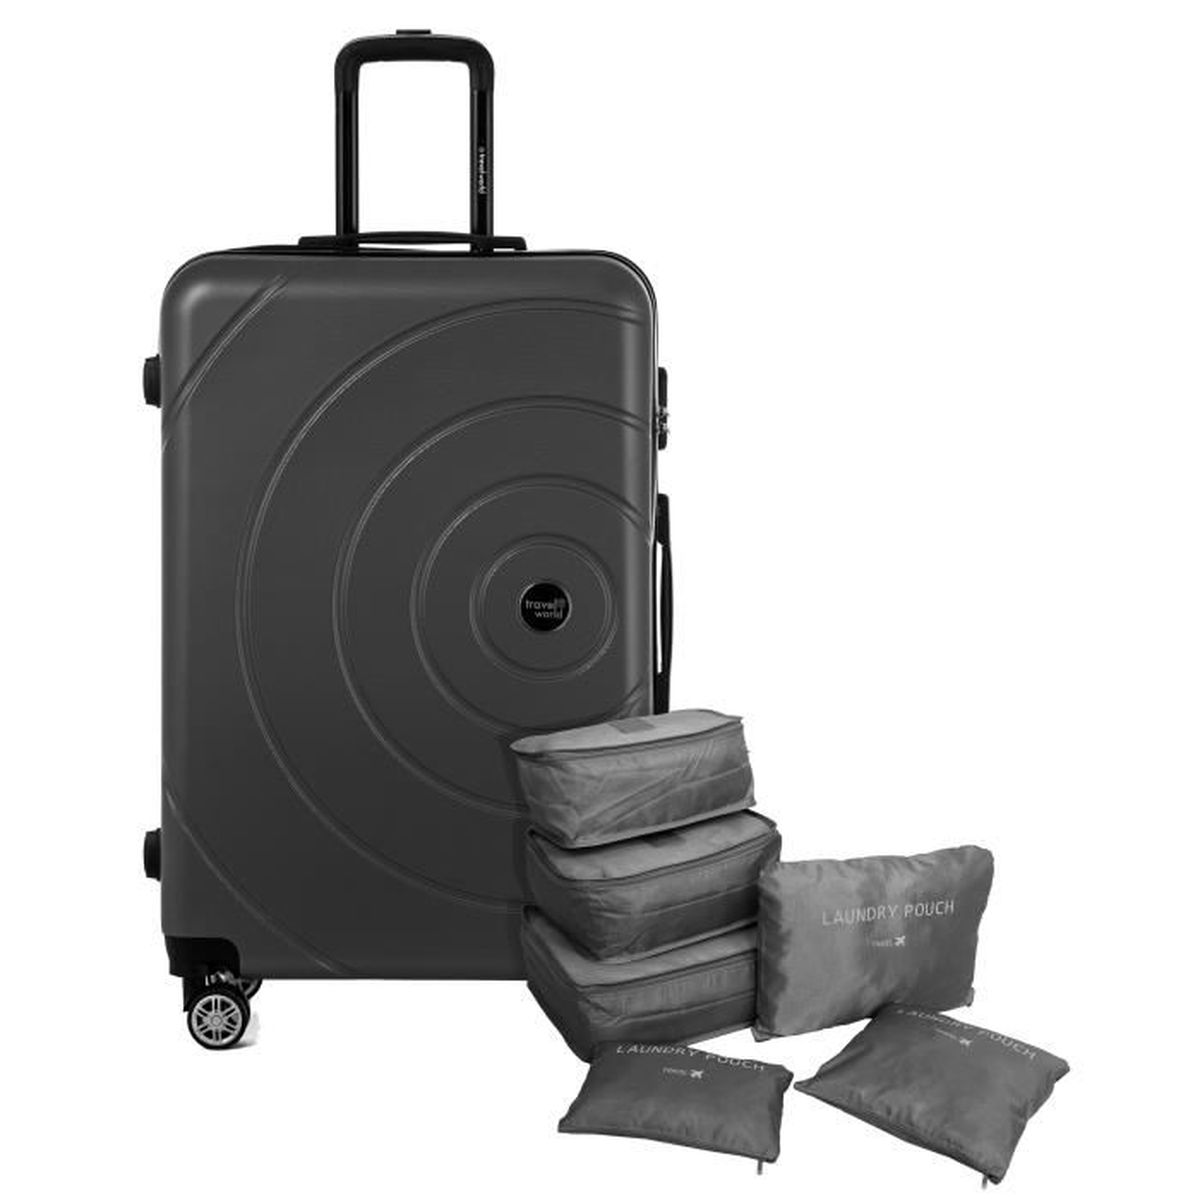 VALISE - BAGAGE TRAVEL WORLD Valise 70 Cm + Set de 6 Organisateurs